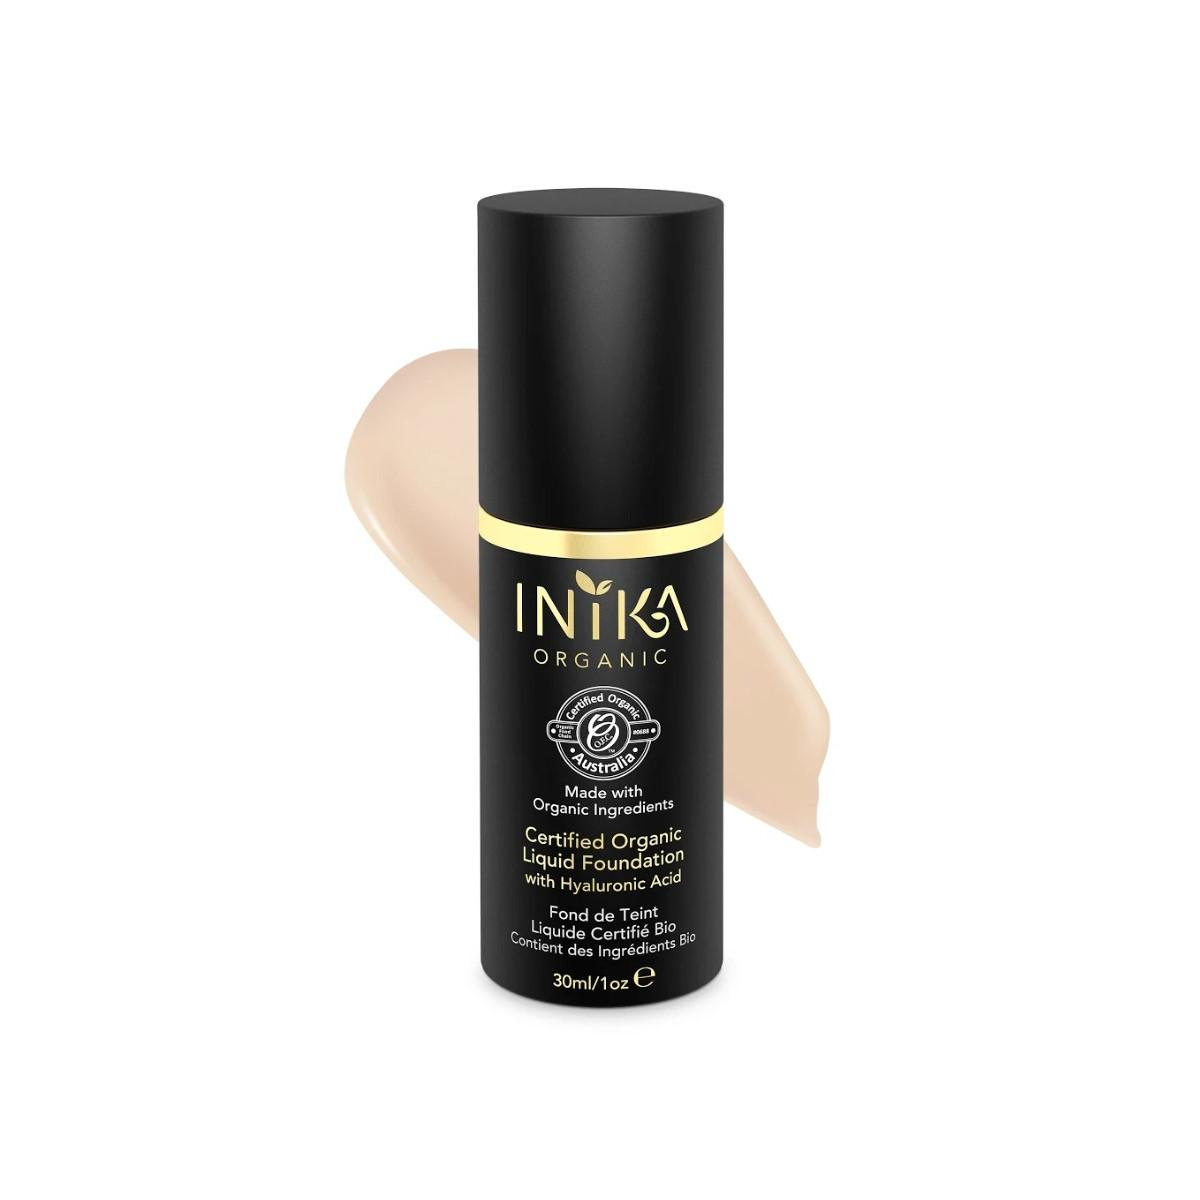 Inika Organic Tekutý make-up s kyselinou hyaluronovou, Porcelain 30 ml